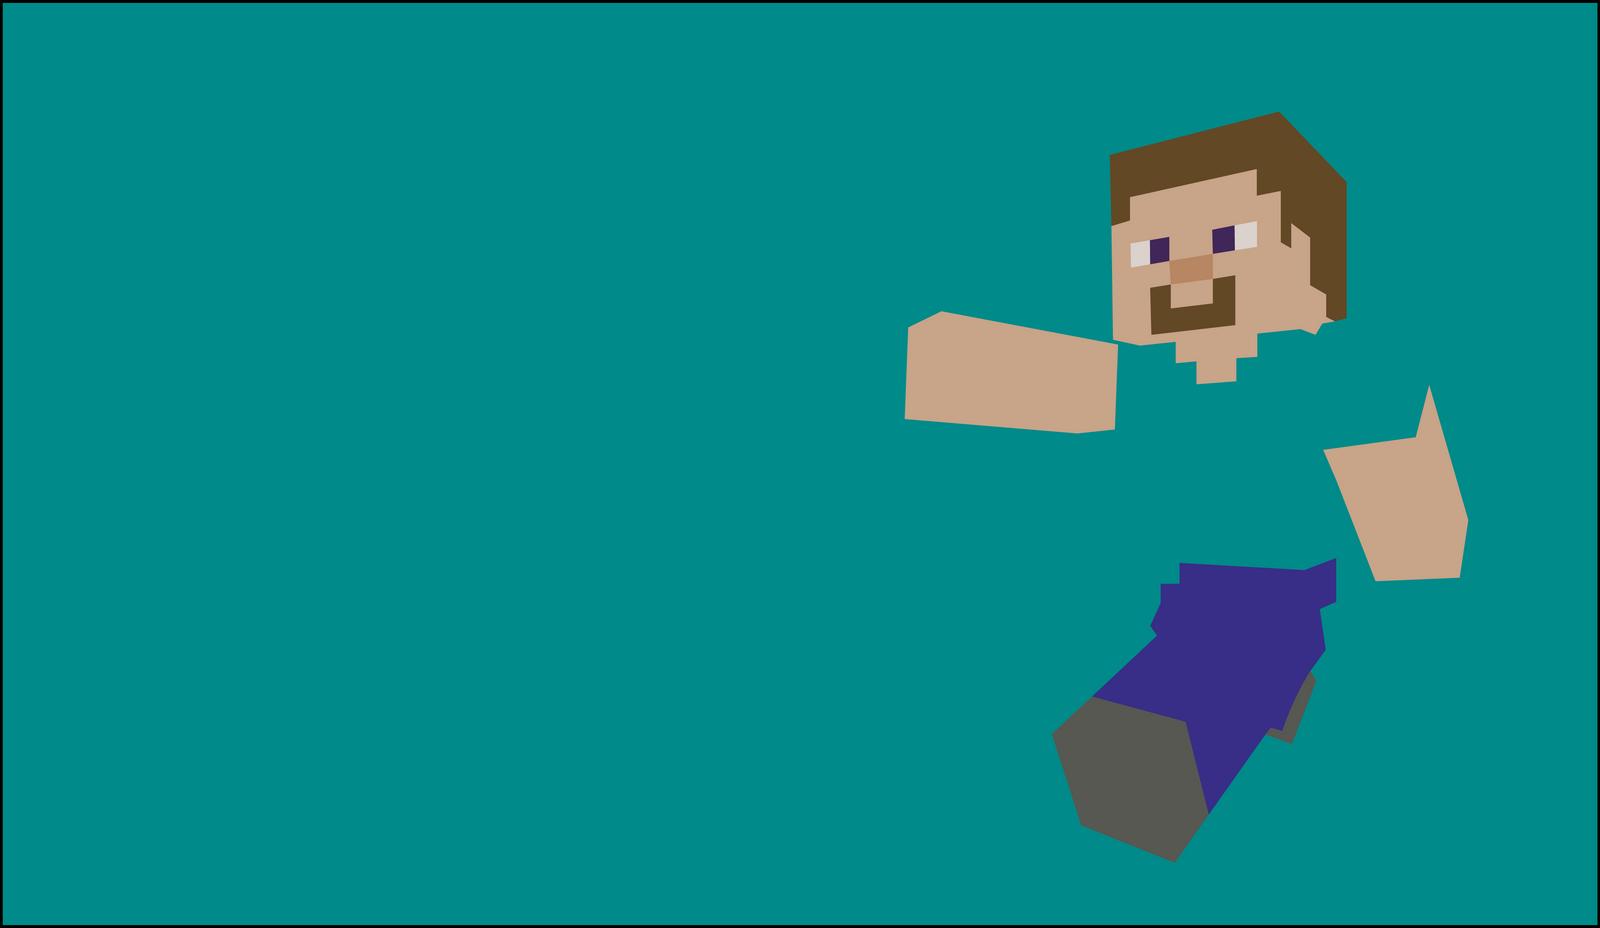 Popular Wallpaper Minecraft Minimalistic - steve_by_dragonitearmy-d6v4333  Snapshot_827153.png